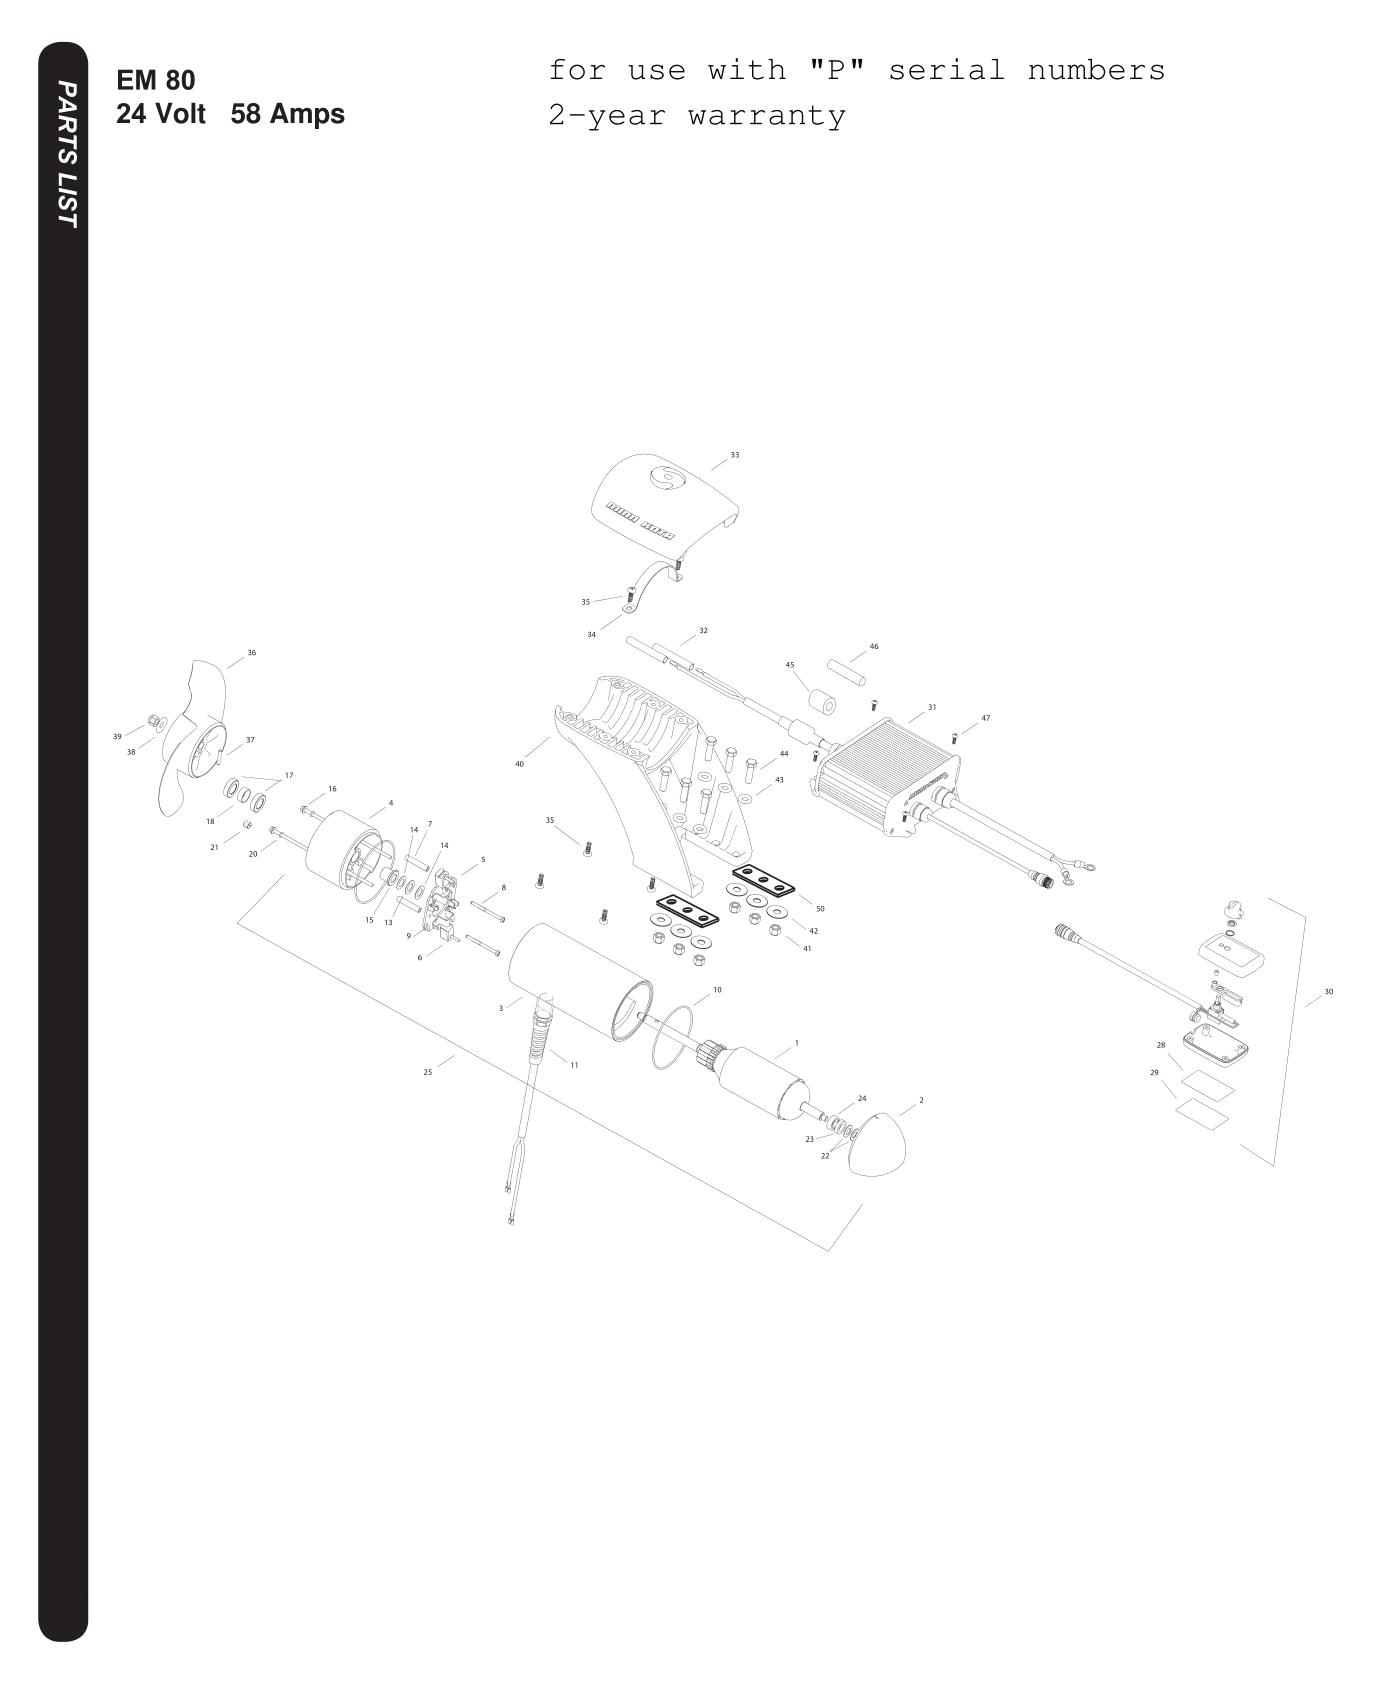 2015-mk-em80-1.png